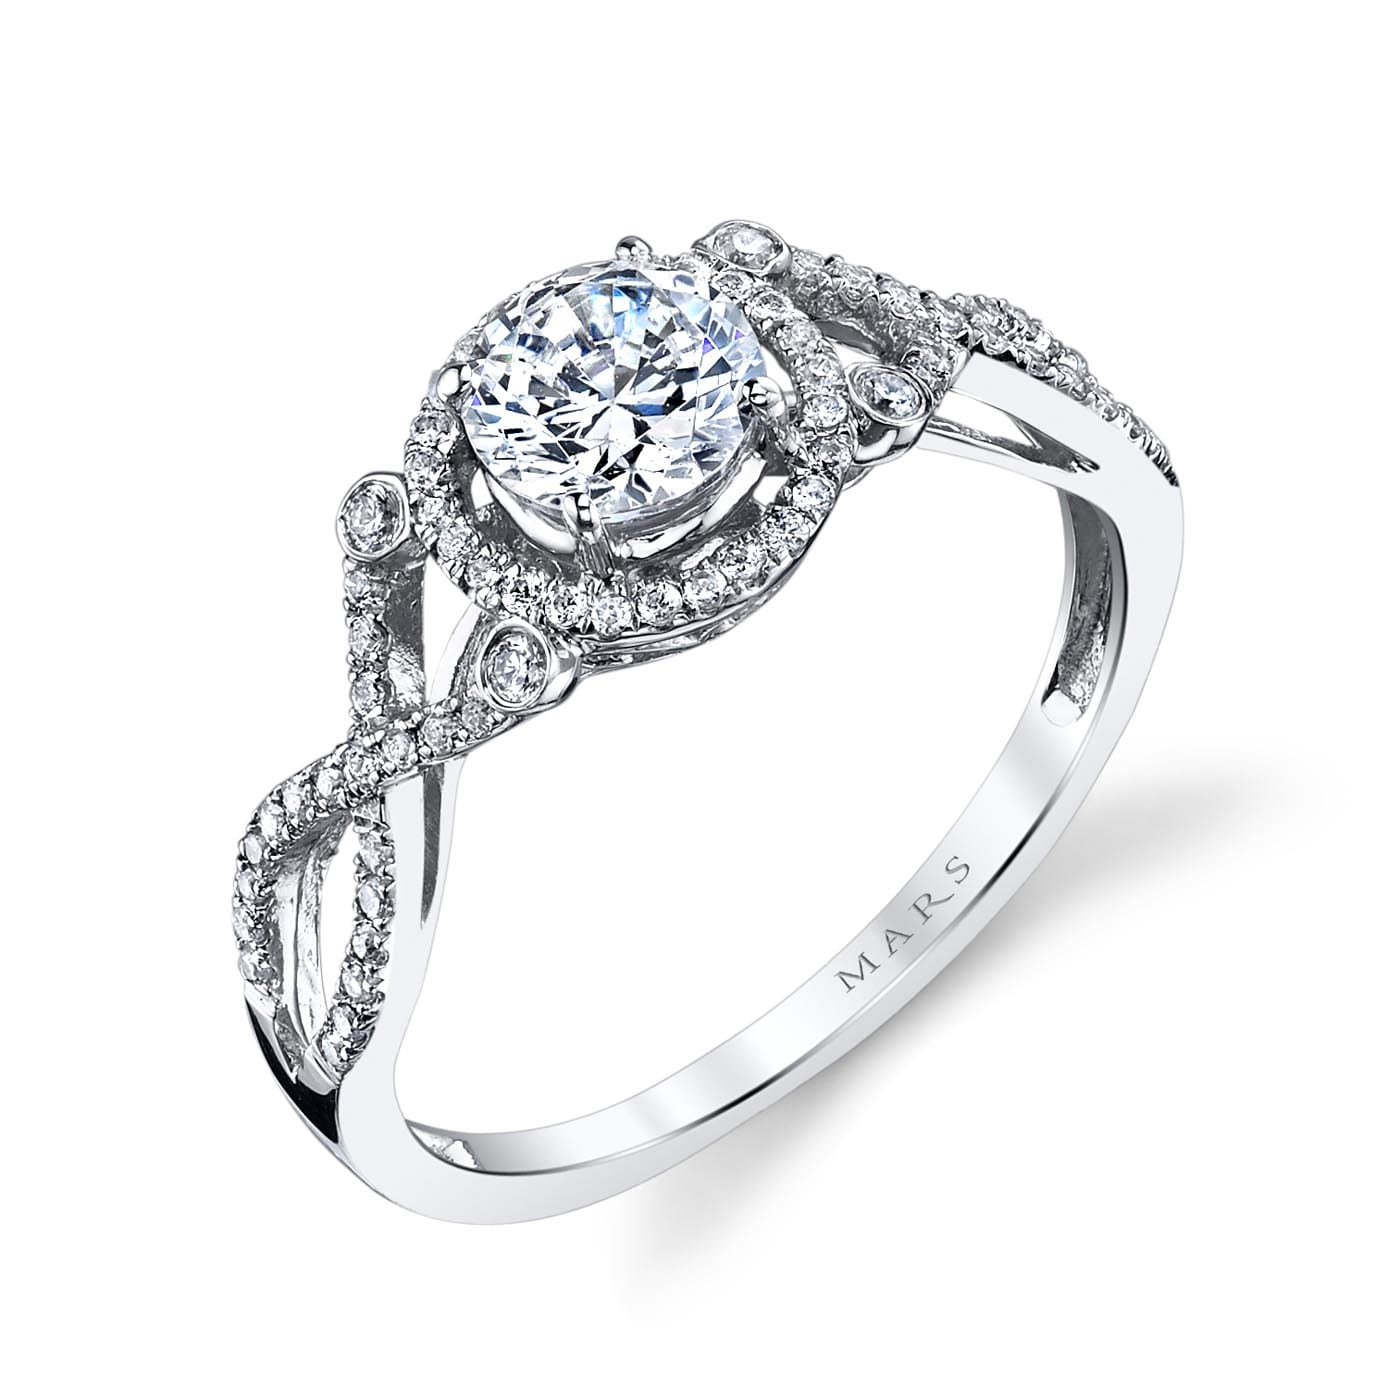 Halo Engagement RingStyle #: MARS 25740